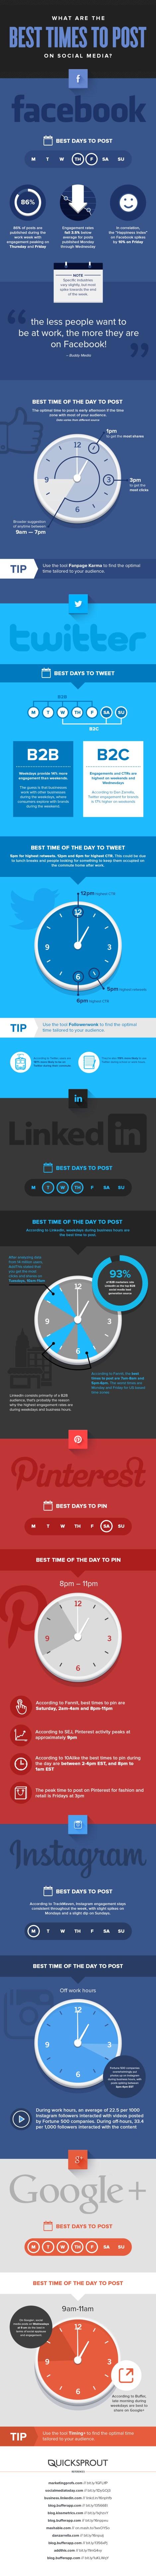 Infografía Mejor momento para publicar en Redes Sociales